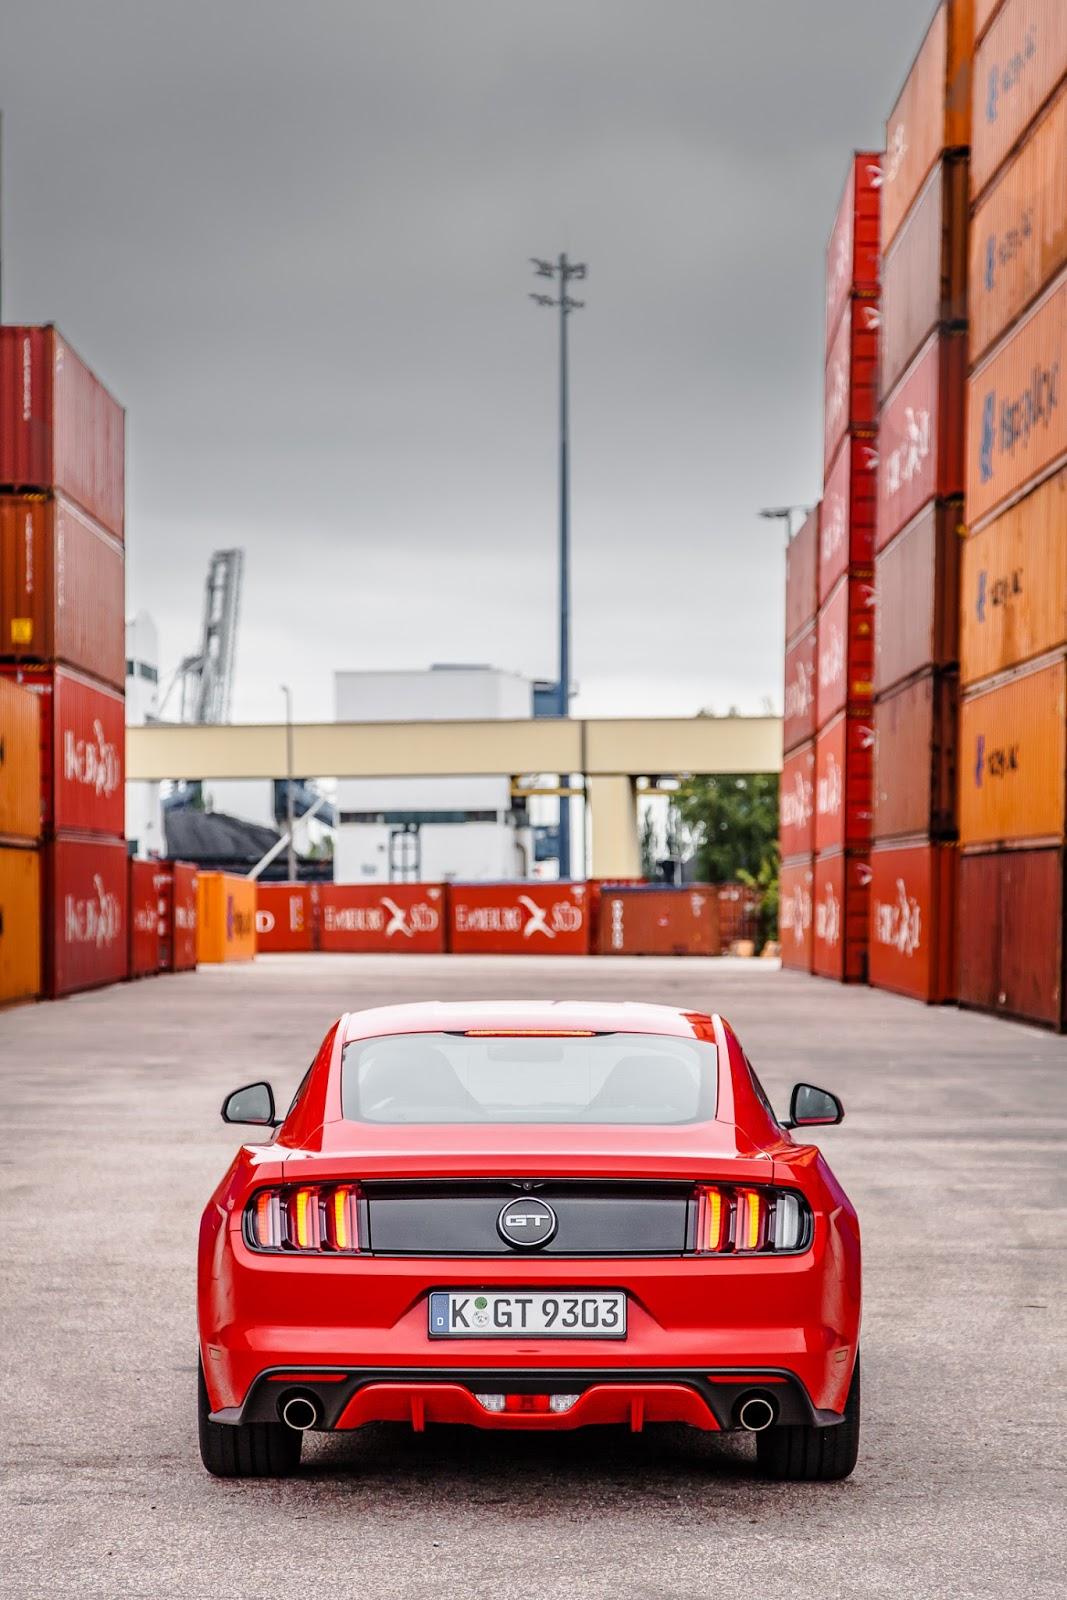 MustangDriveDeauville2015 18 Άνοδος Ευρωπαϊκών πωλήσεων για την Ford Ford, Sales, πωλήσεις, πωλήσεις αυτοκινήτων